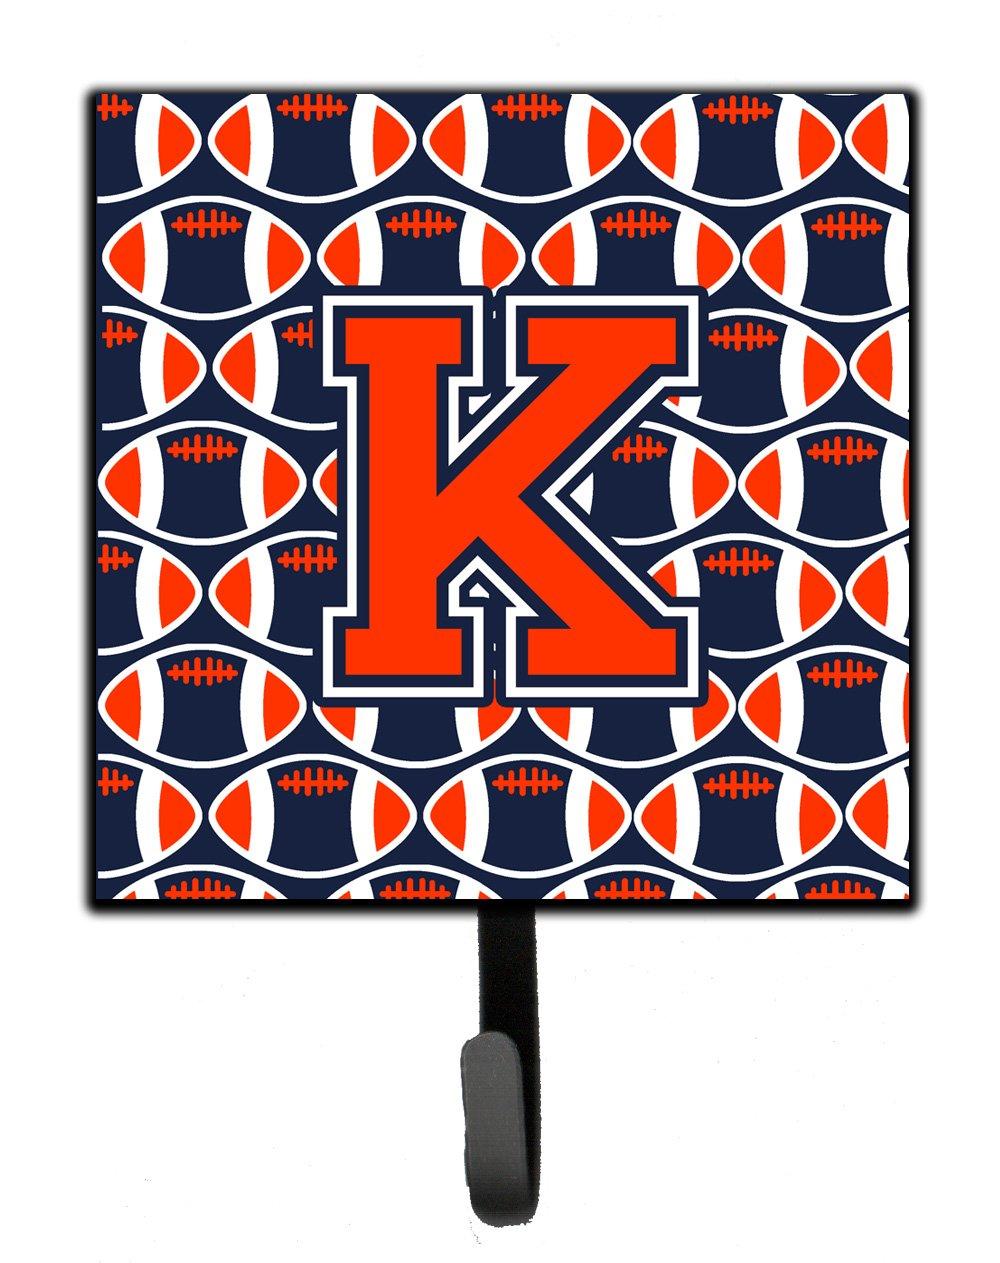 Carolines Treasures Letter K Football Orange Blue and White Leash or Key Holder CJ1066-KSH4 Small Multicolor